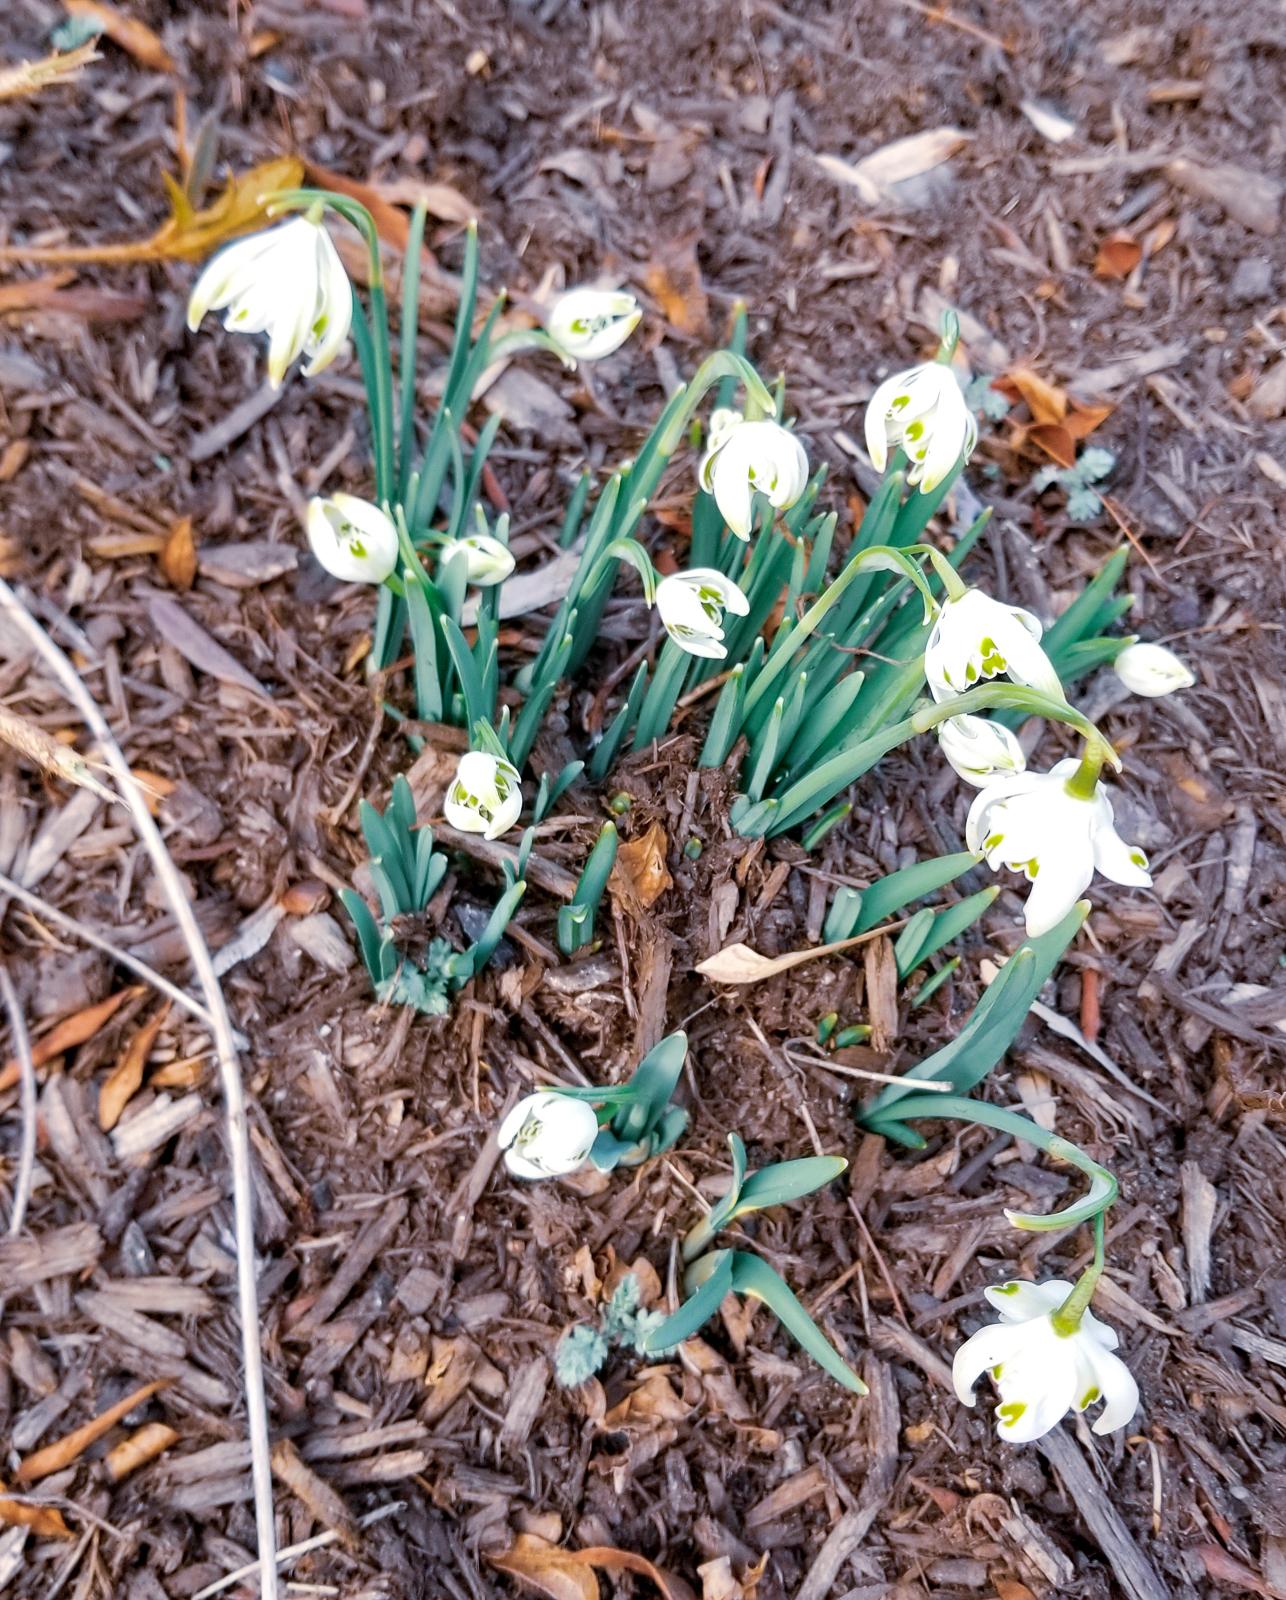 Crocuses Spring Flowers Photos